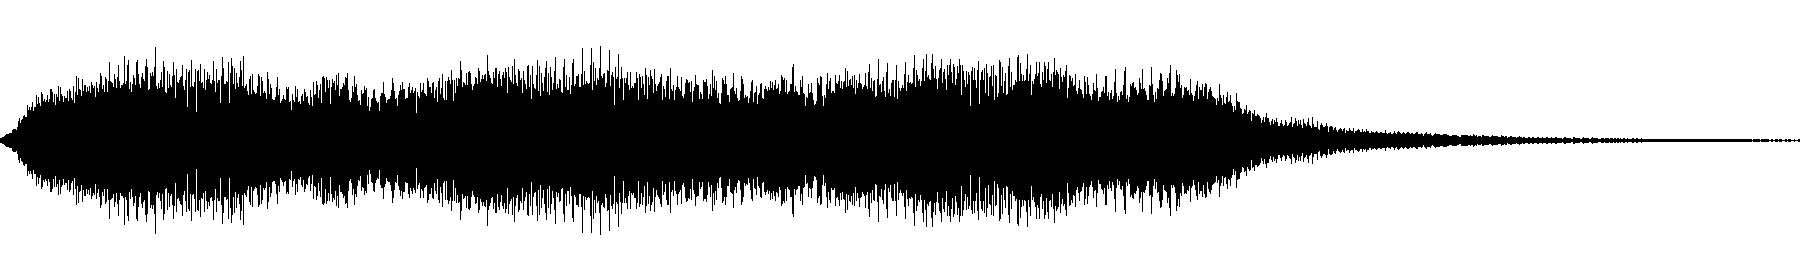 organ c